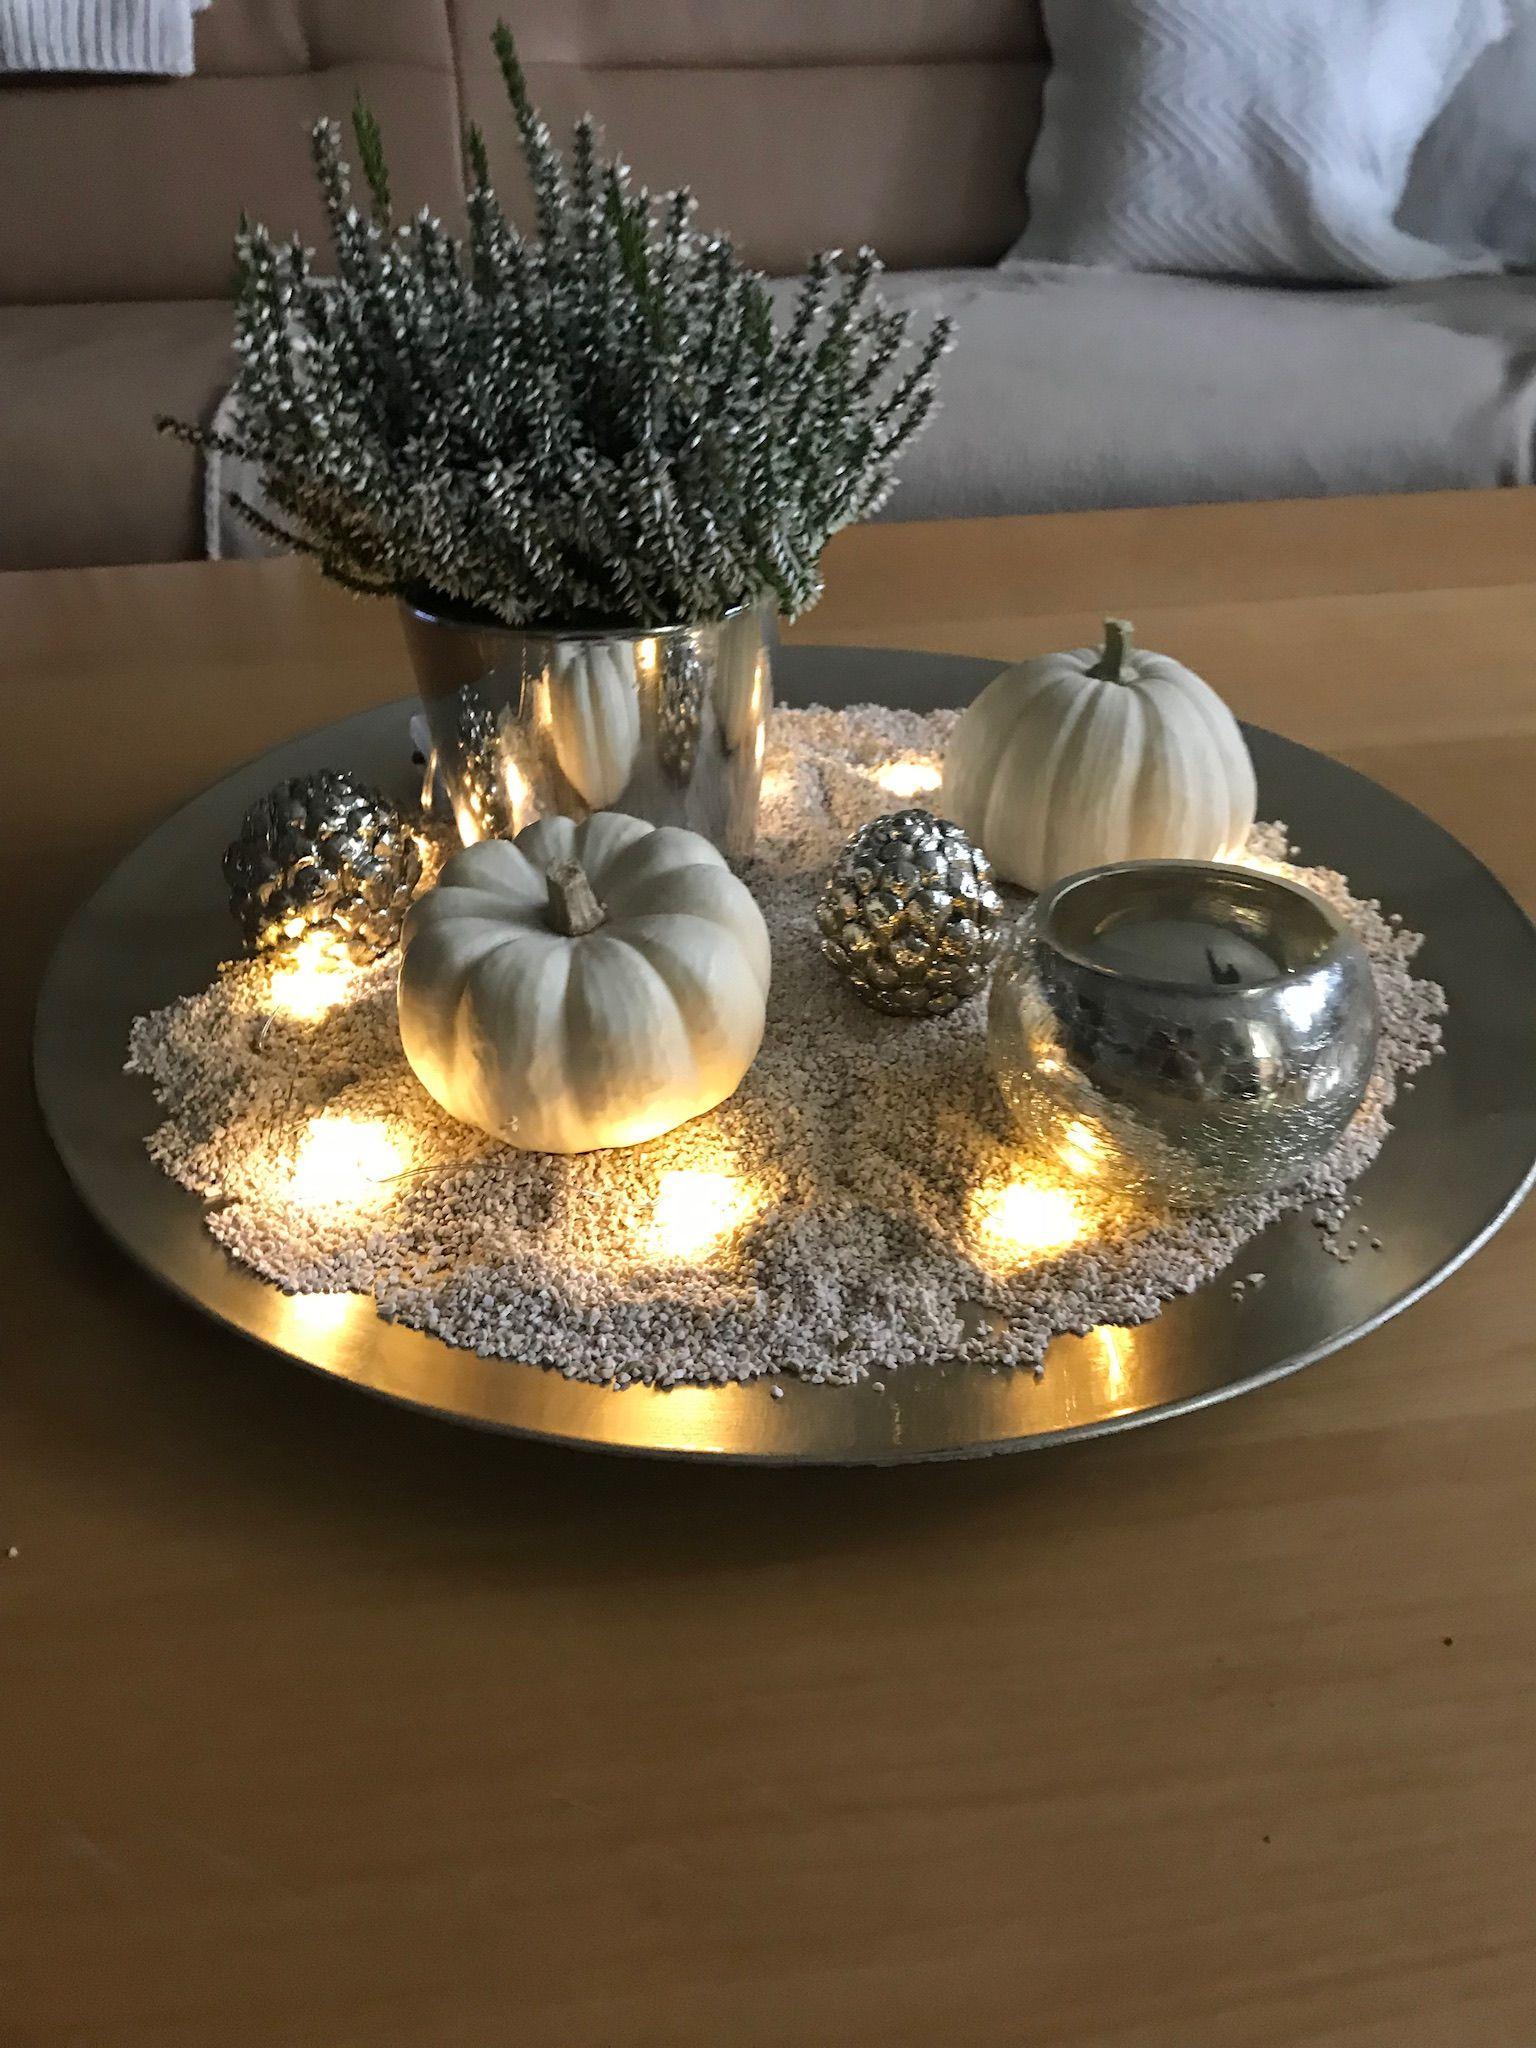 Herbstdeko Silber Weiss Herbst Dekoration Herbstdeko